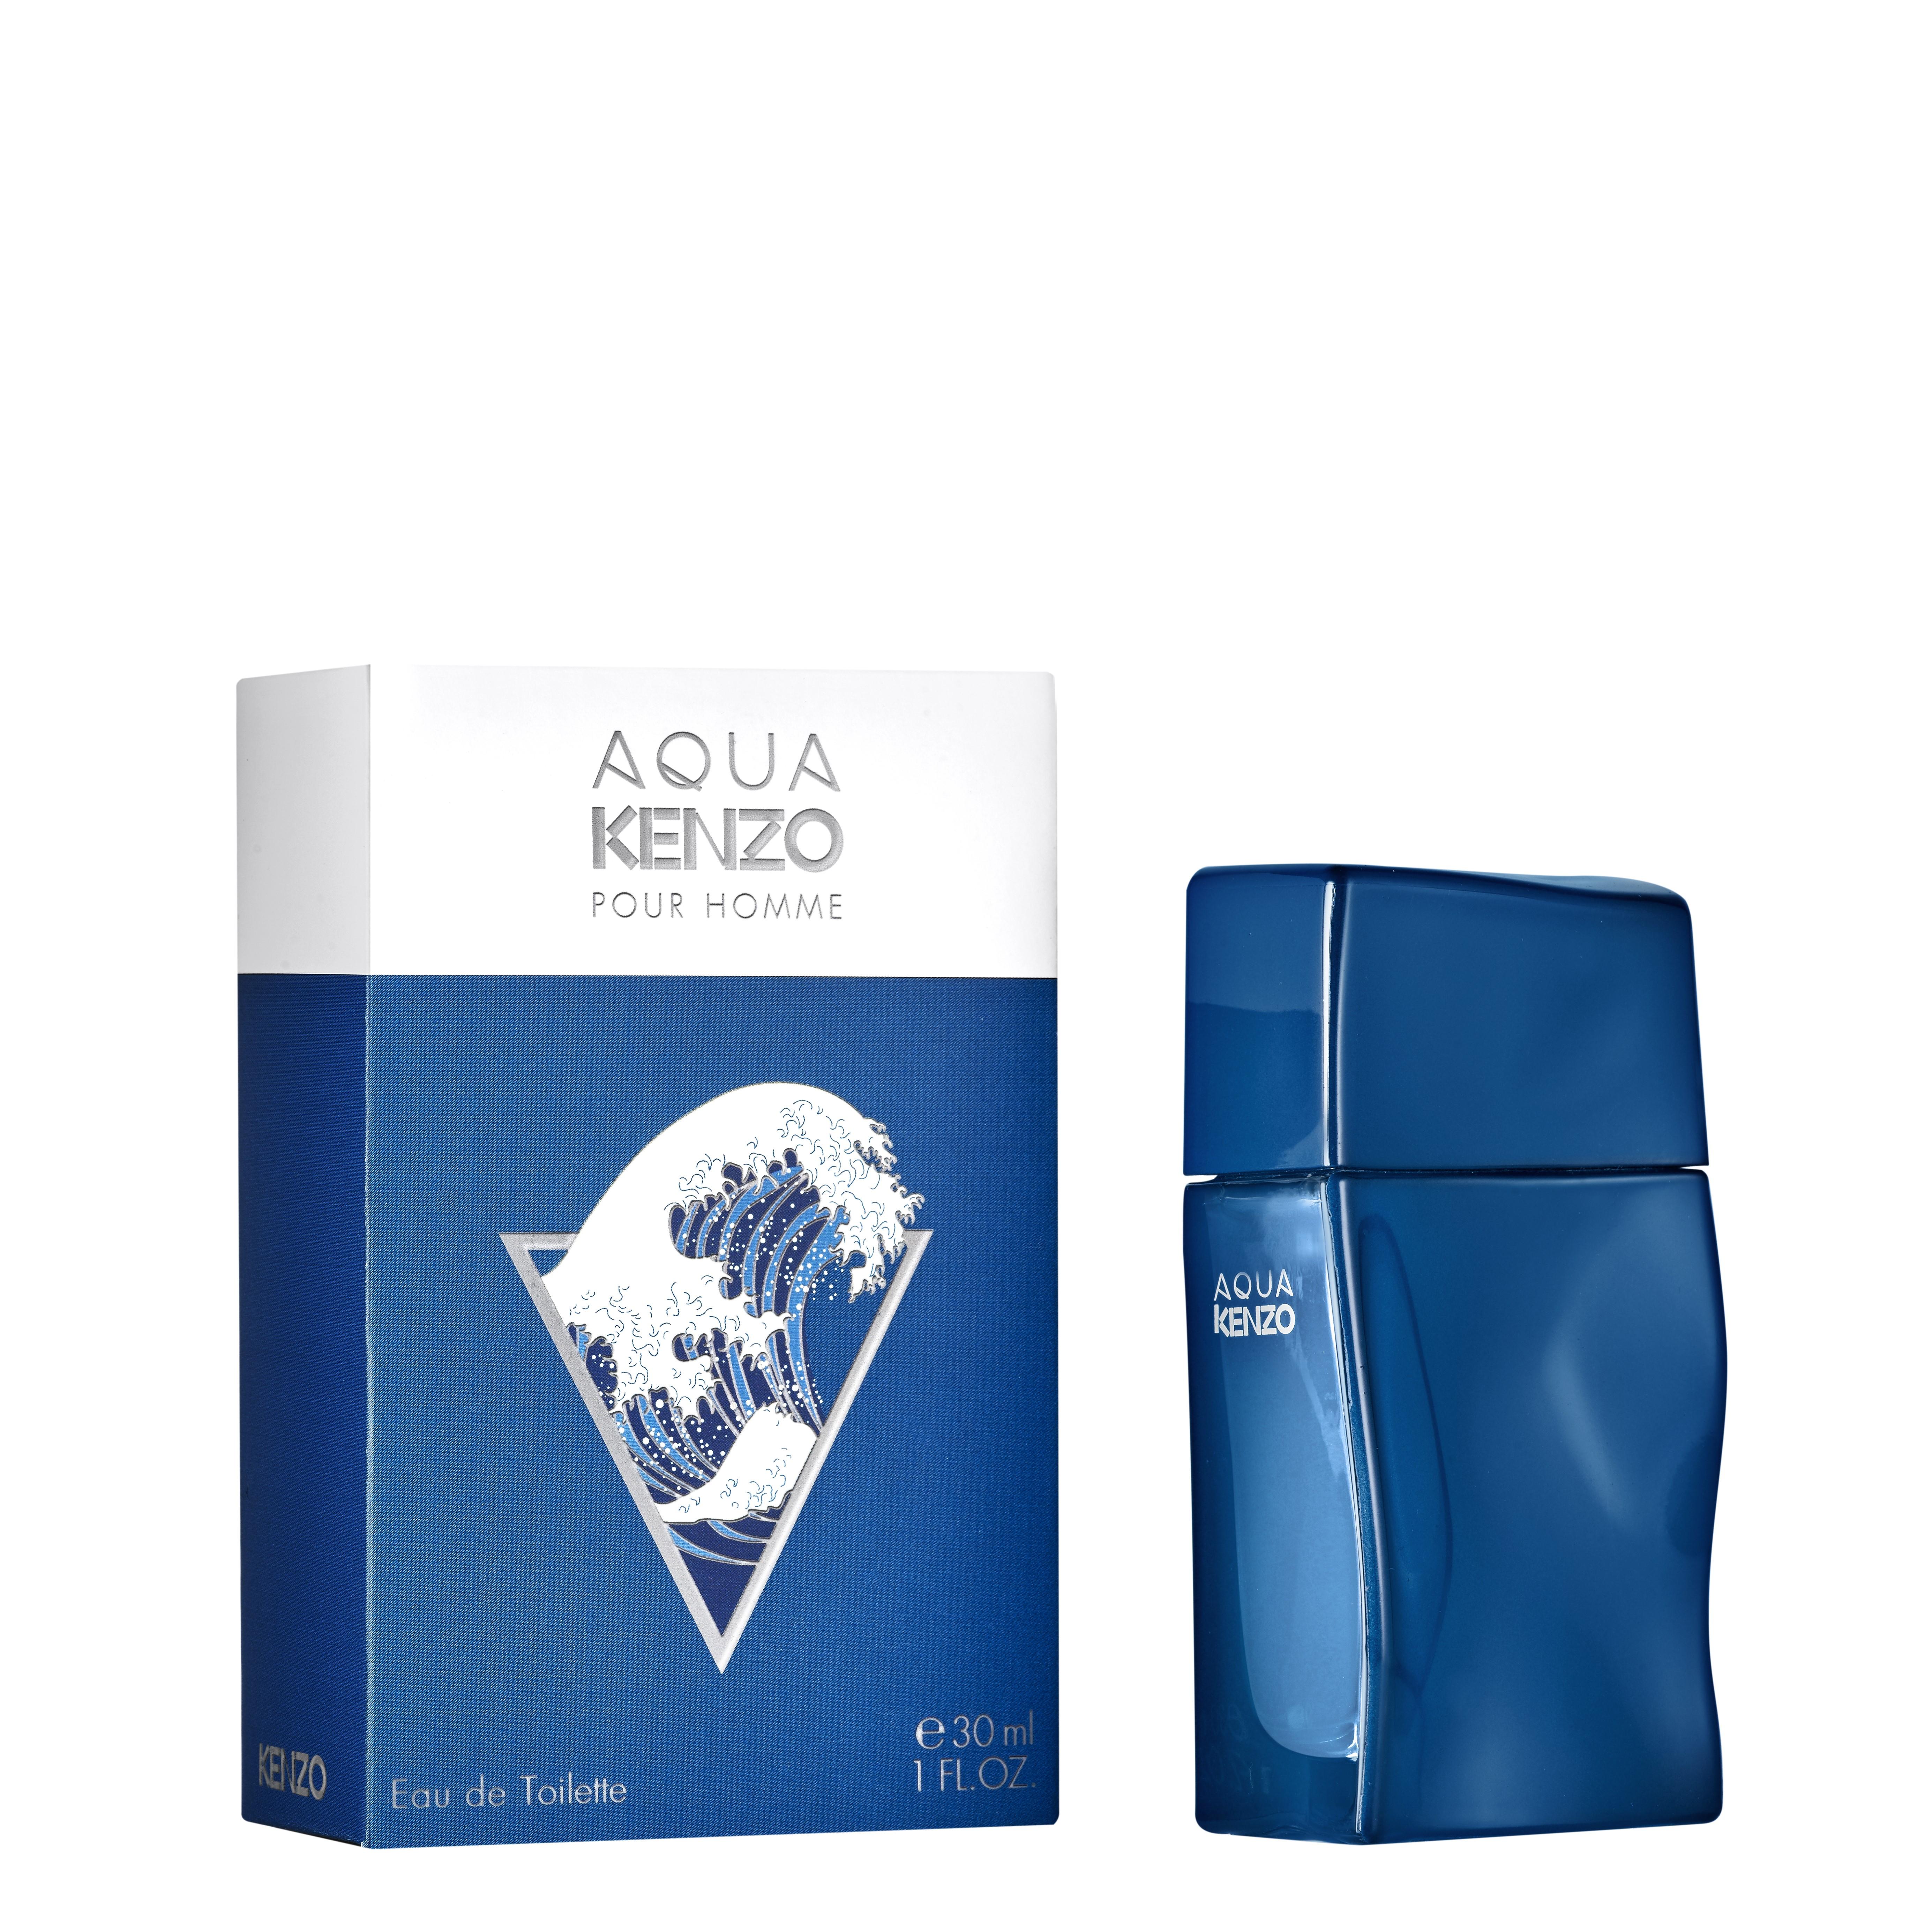 Kenzo Aquakenzo Homme EDT, 30 ml